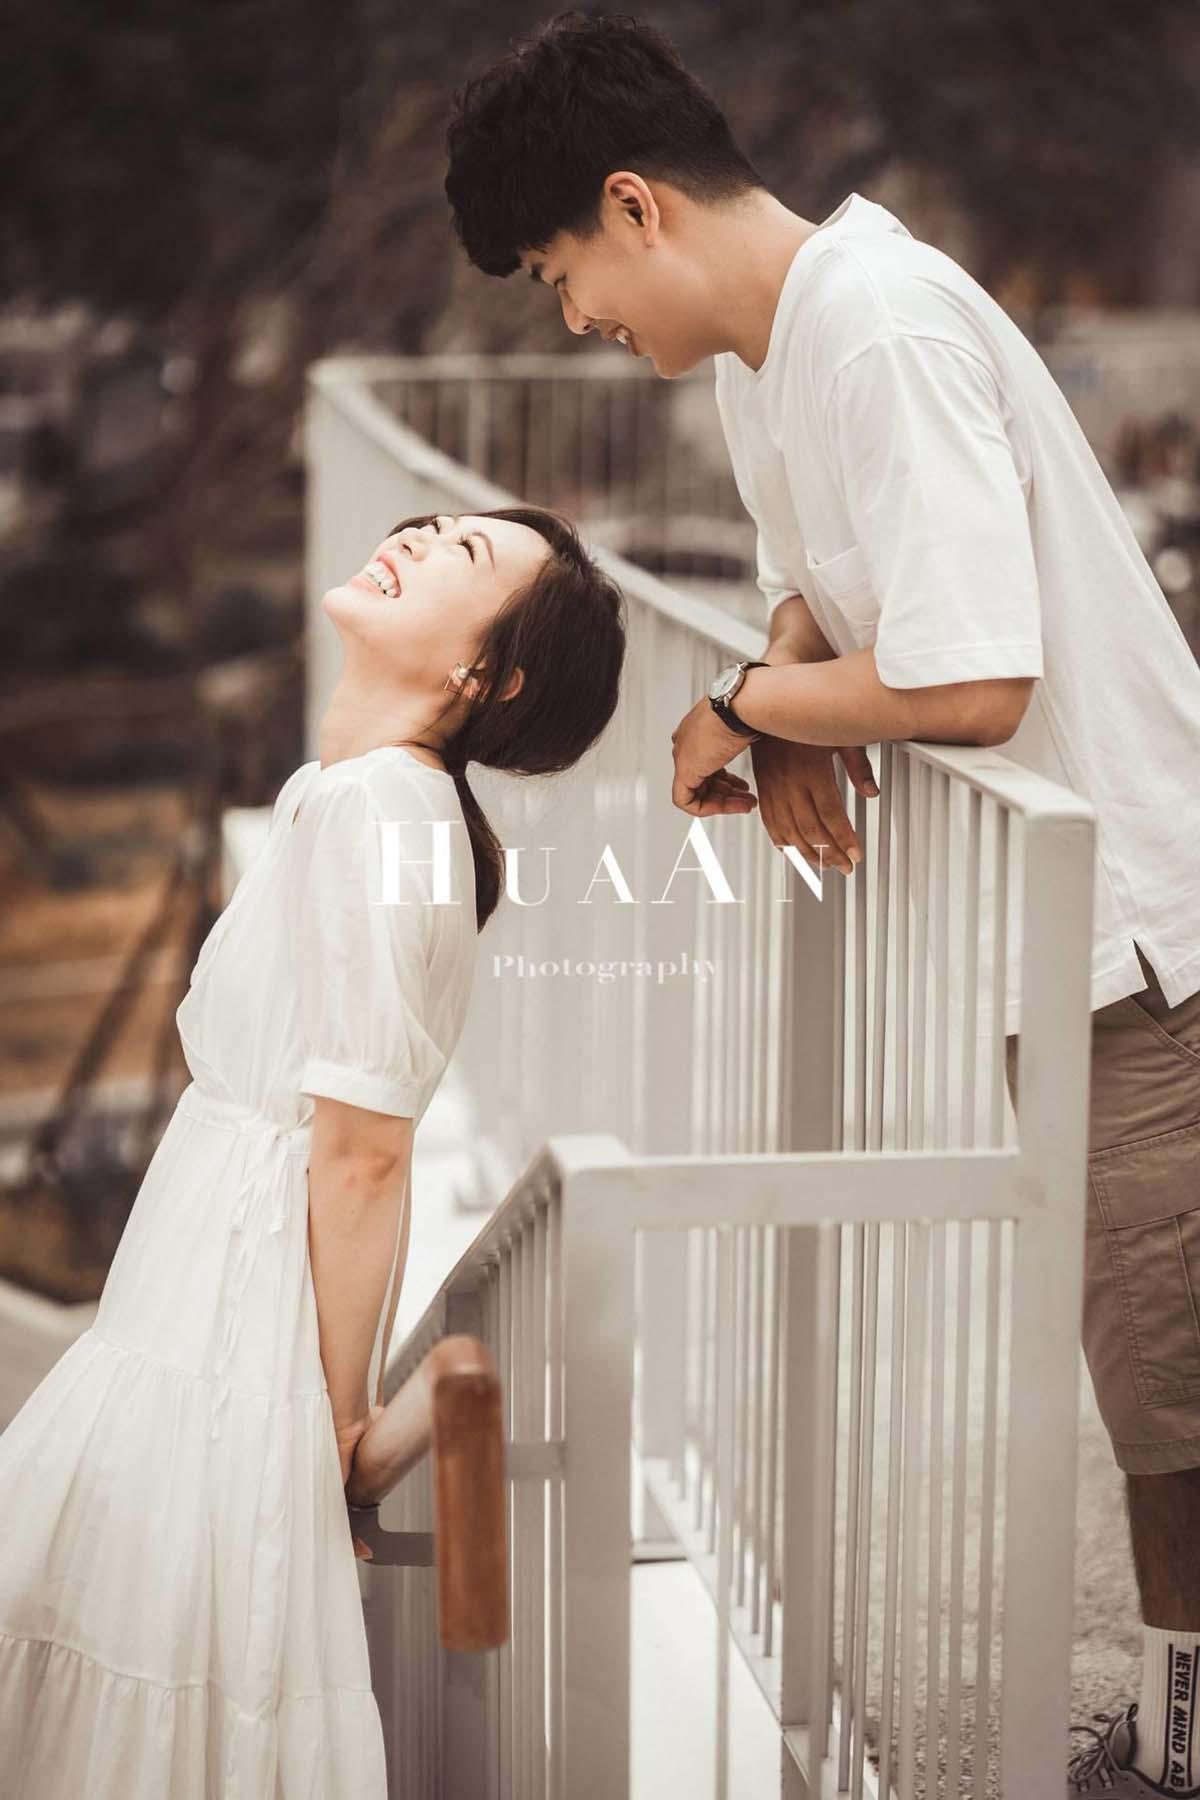 HuaAn photography 台中婚紗 冉冉婚紗 歐美婚紗 美式婚紗